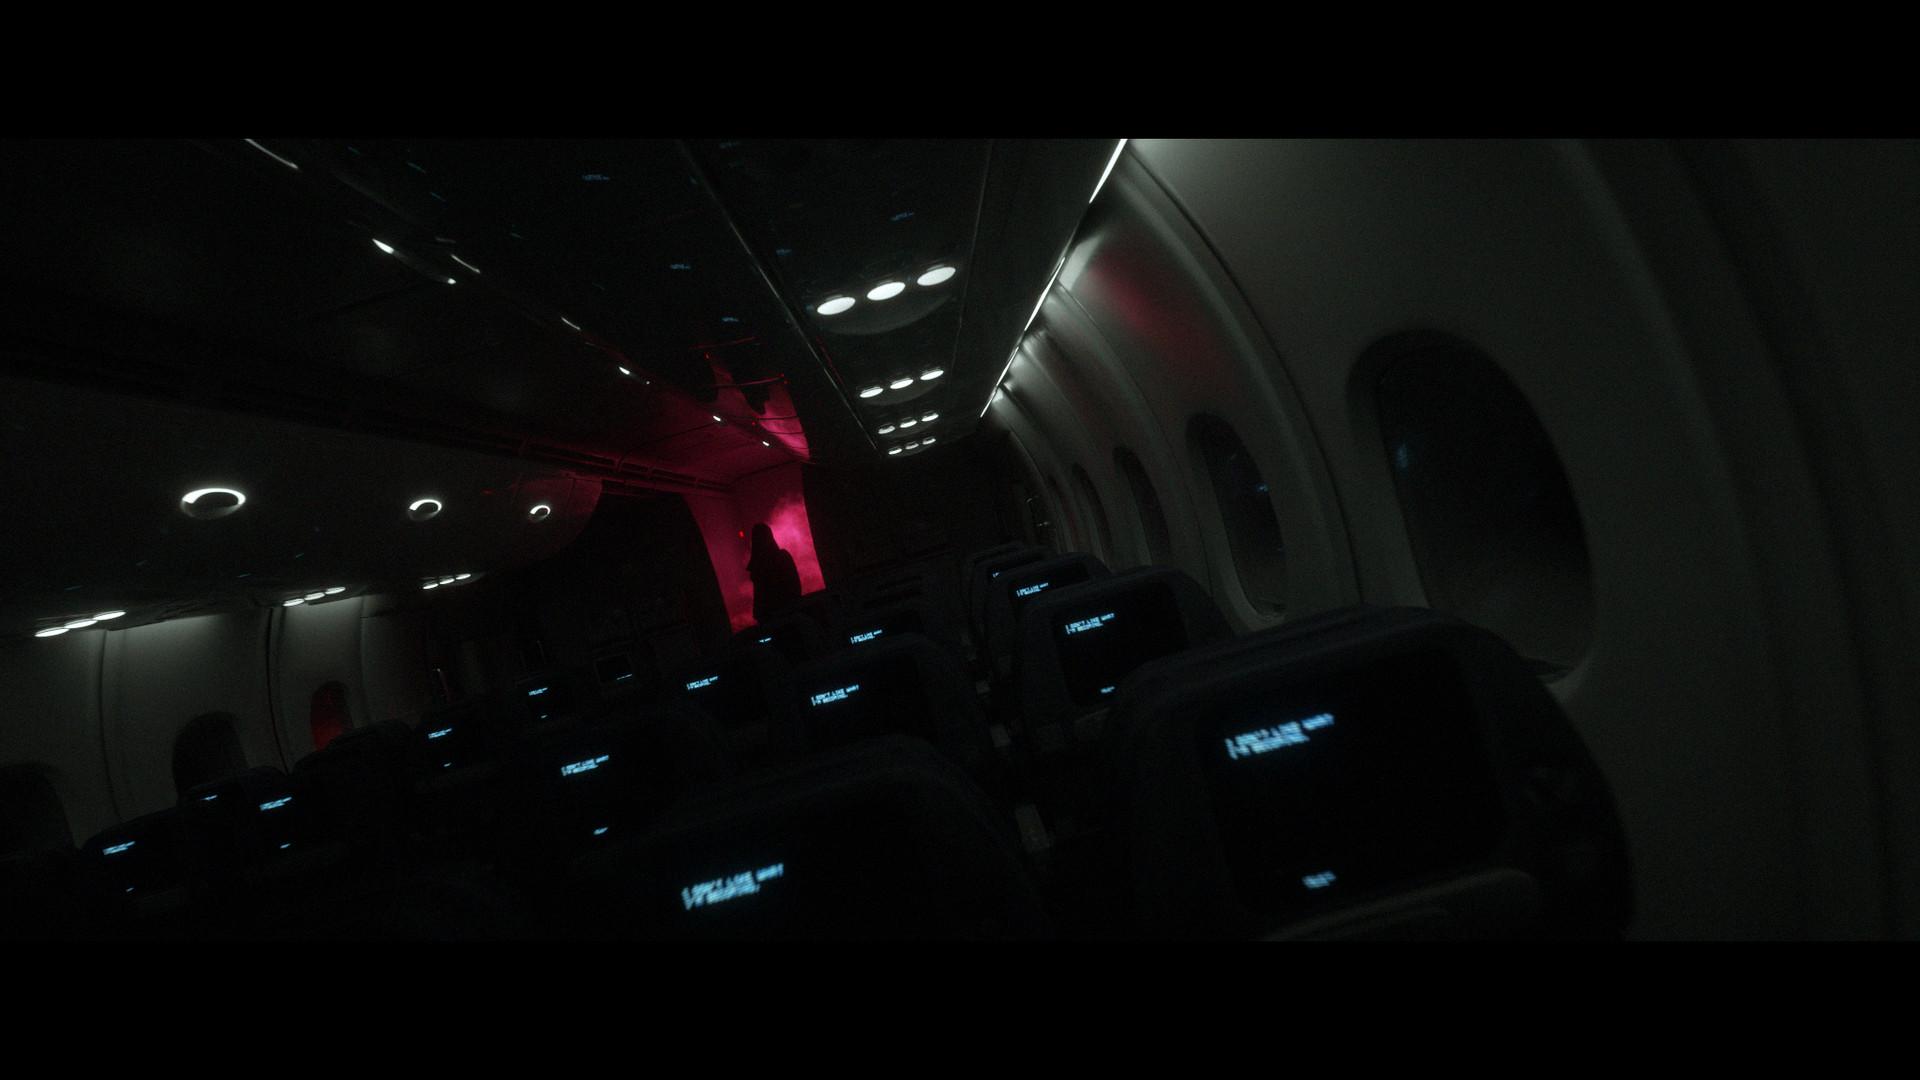 Mark chang airplane 0001 8